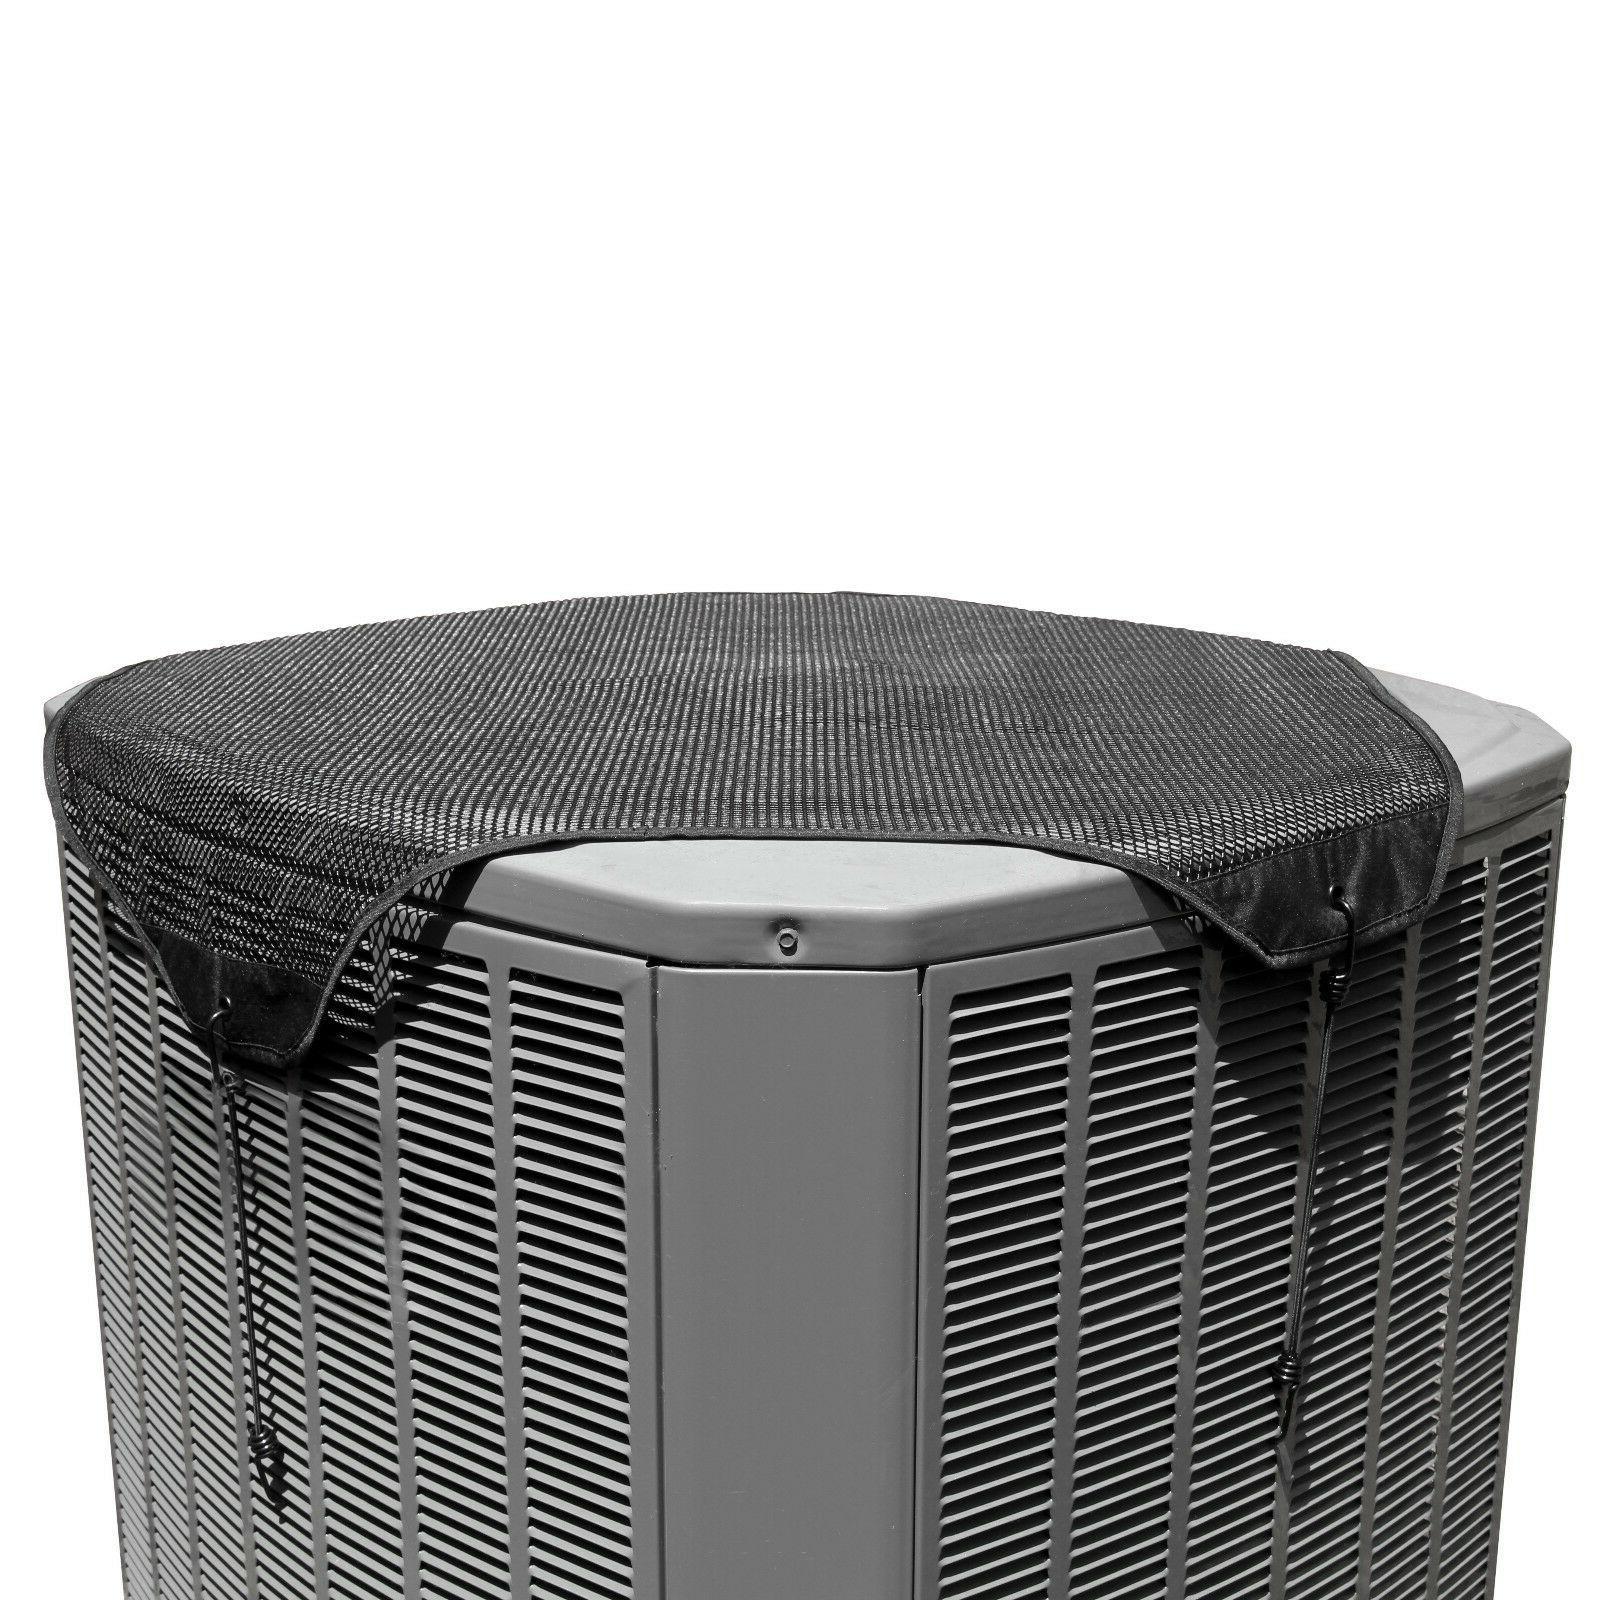 Sturdy AC - Air Conditioner